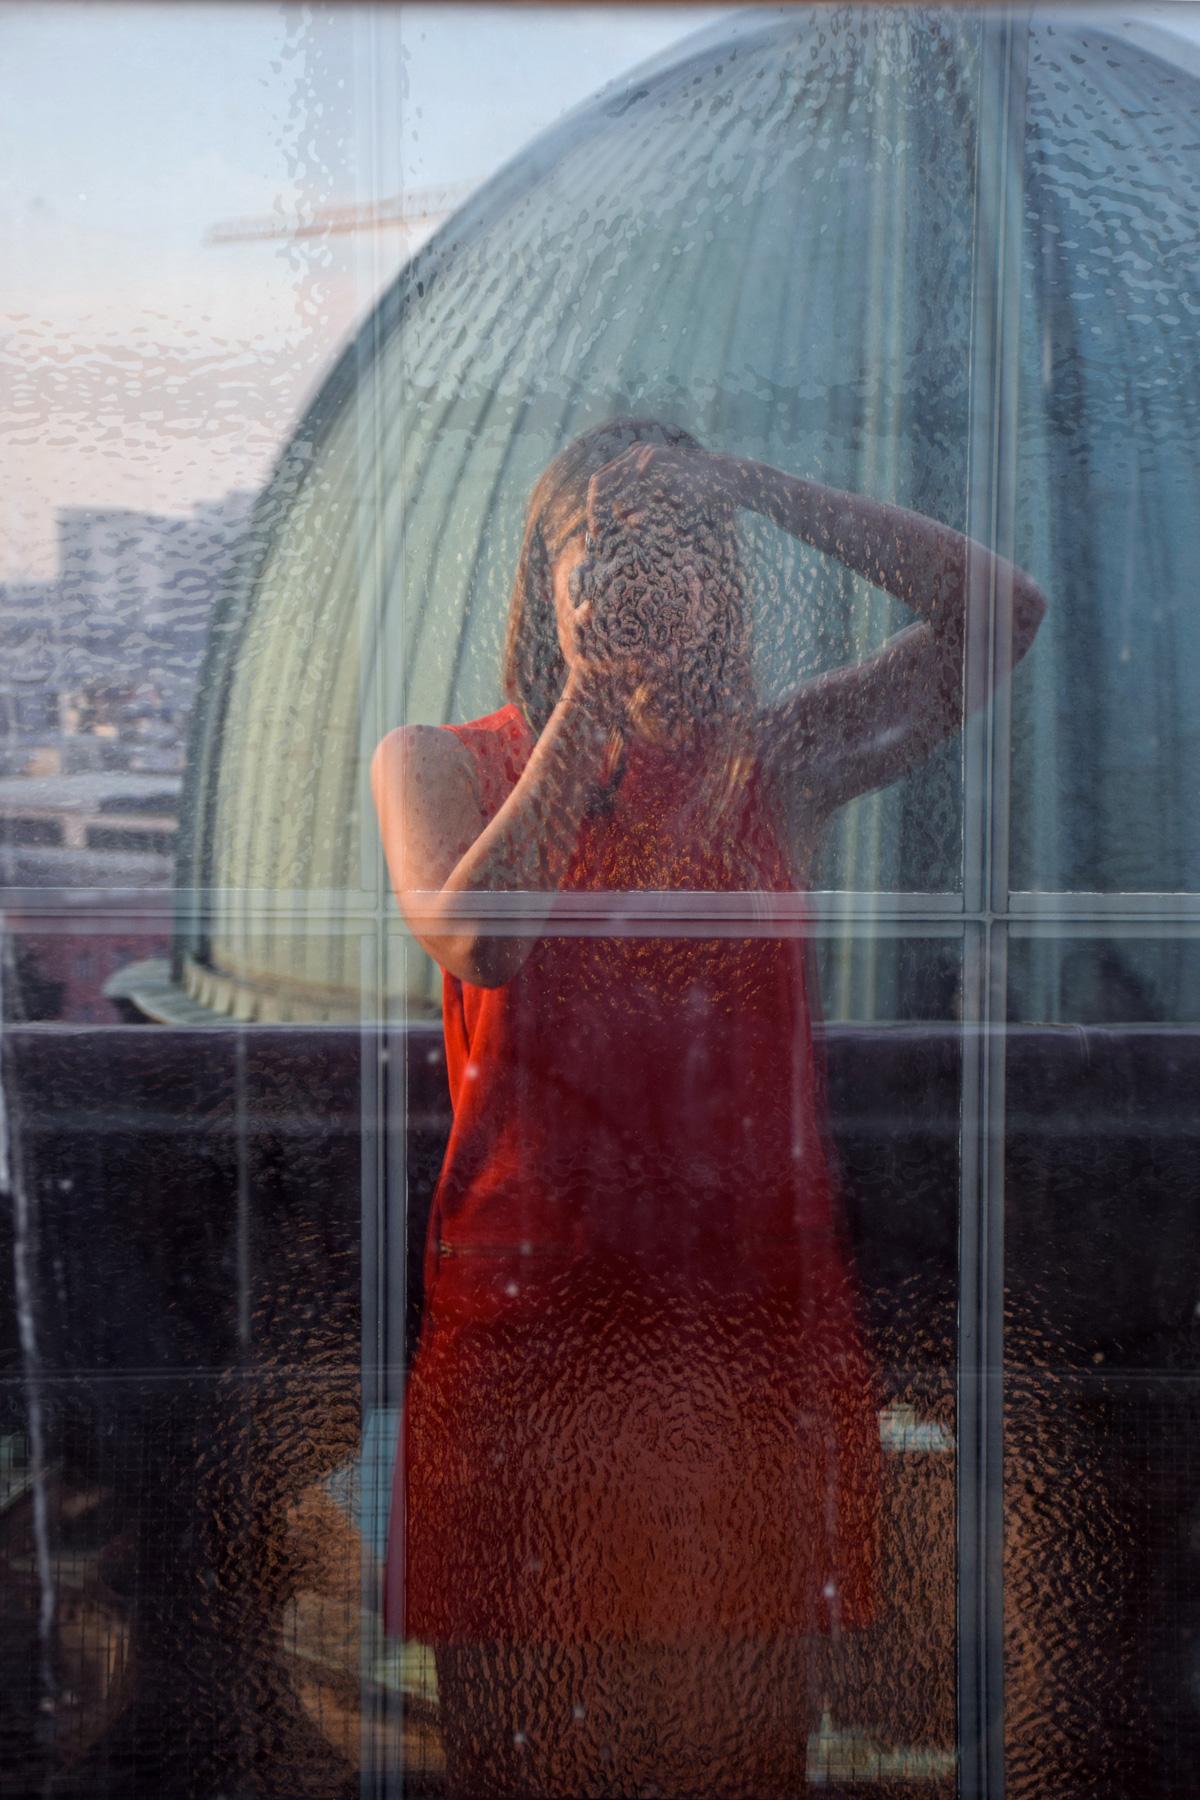 reflection-berlin-dome.jpg